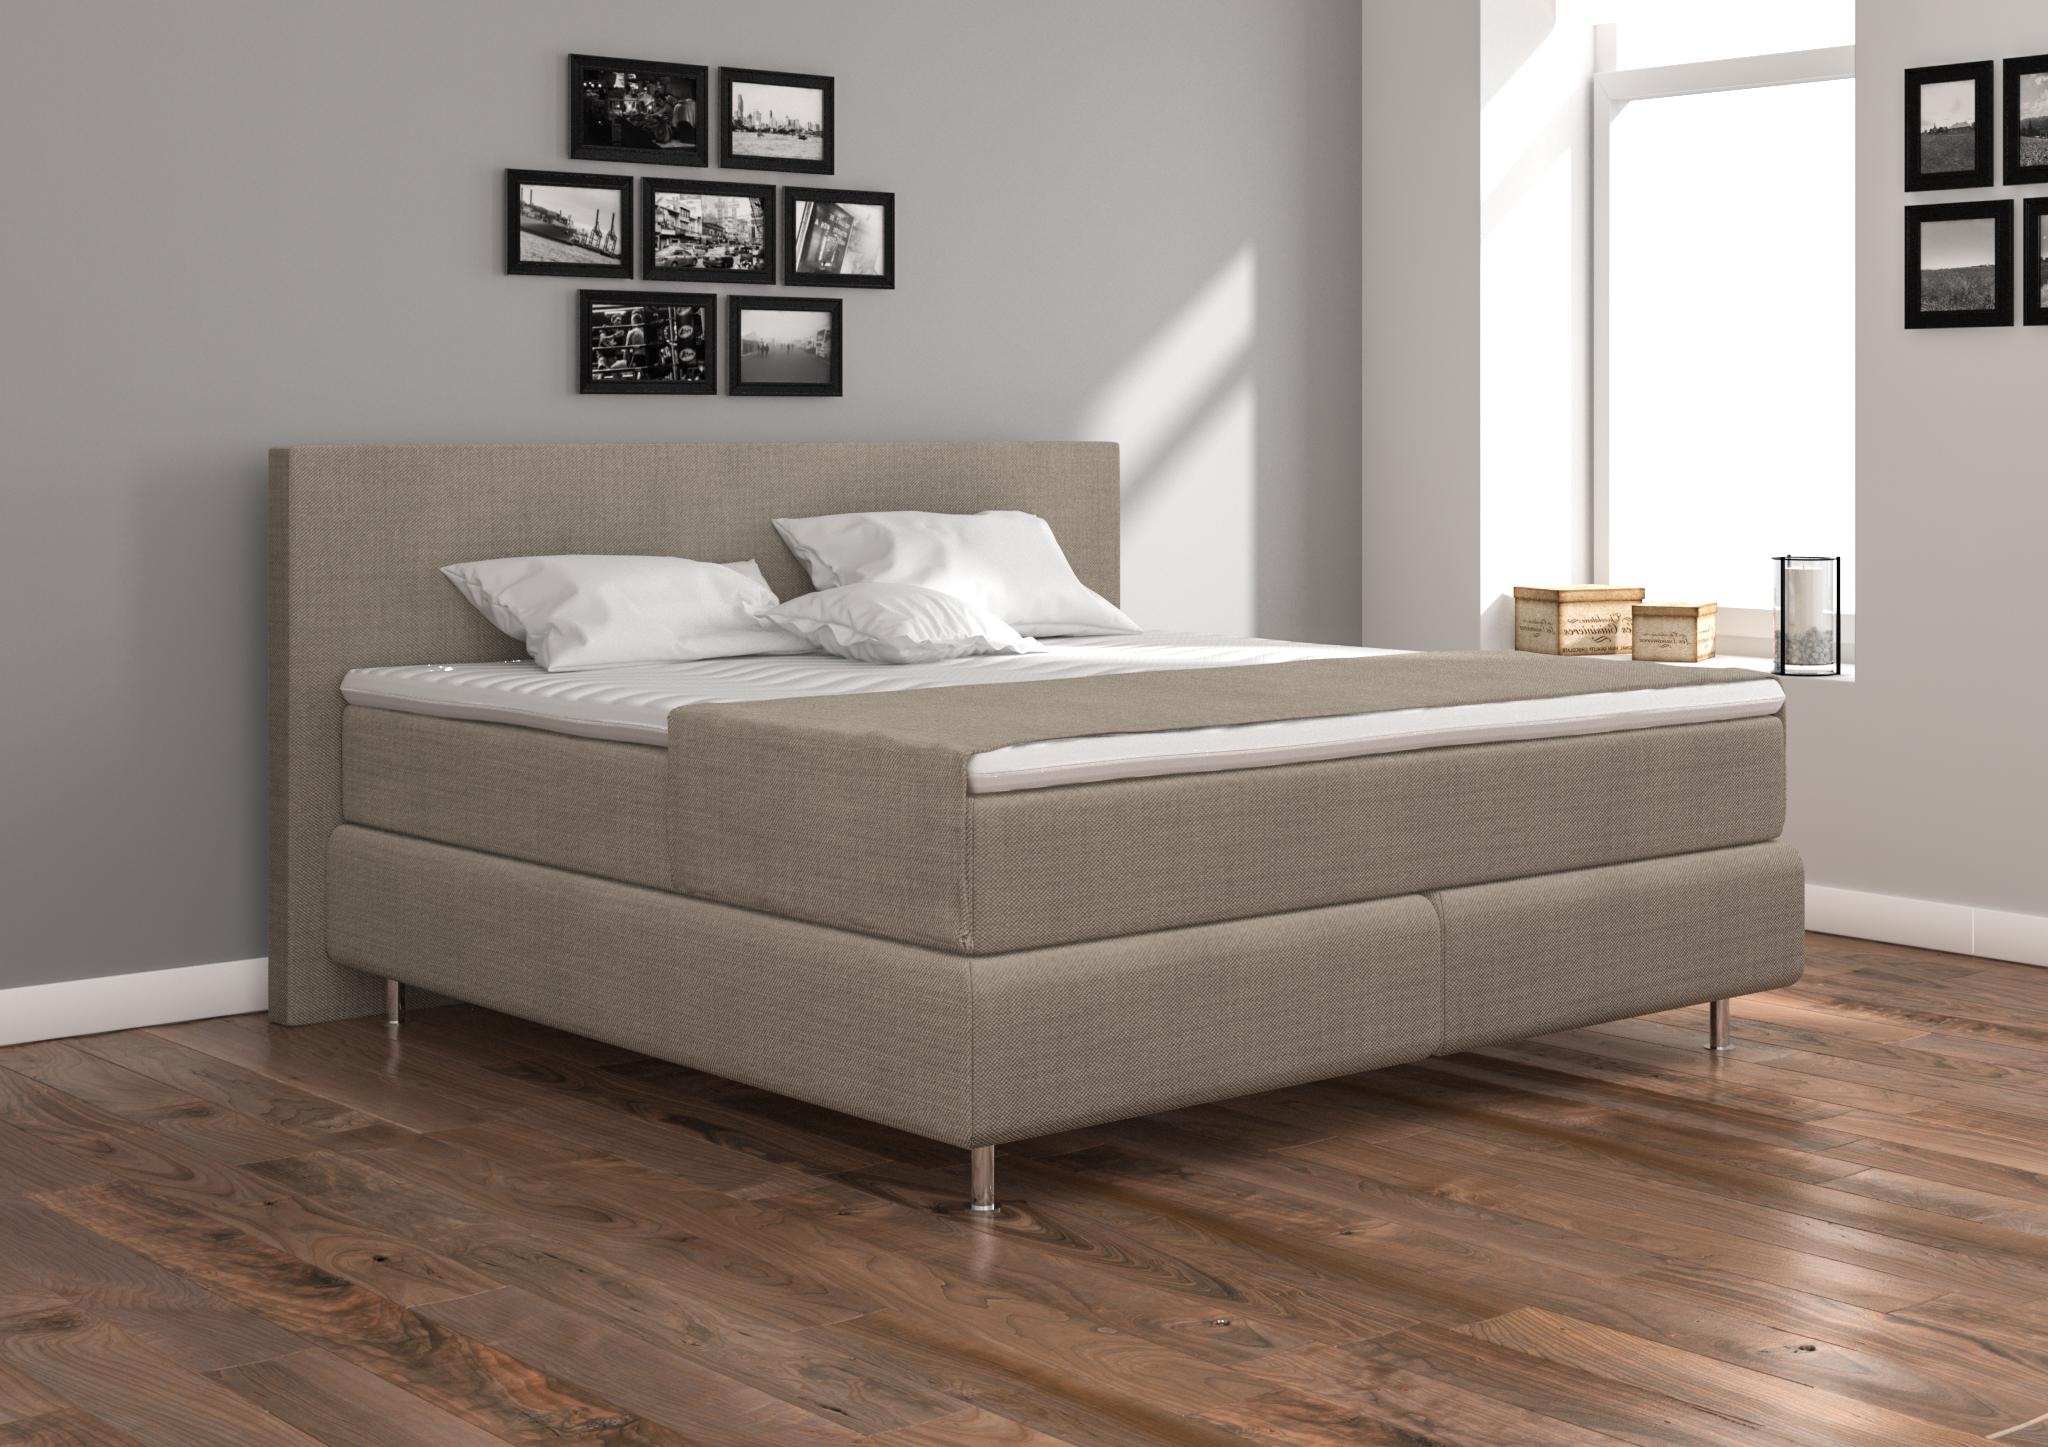 boxspringbett 200x200 g nstig und sofort lieferbar. Black Bedroom Furniture Sets. Home Design Ideas